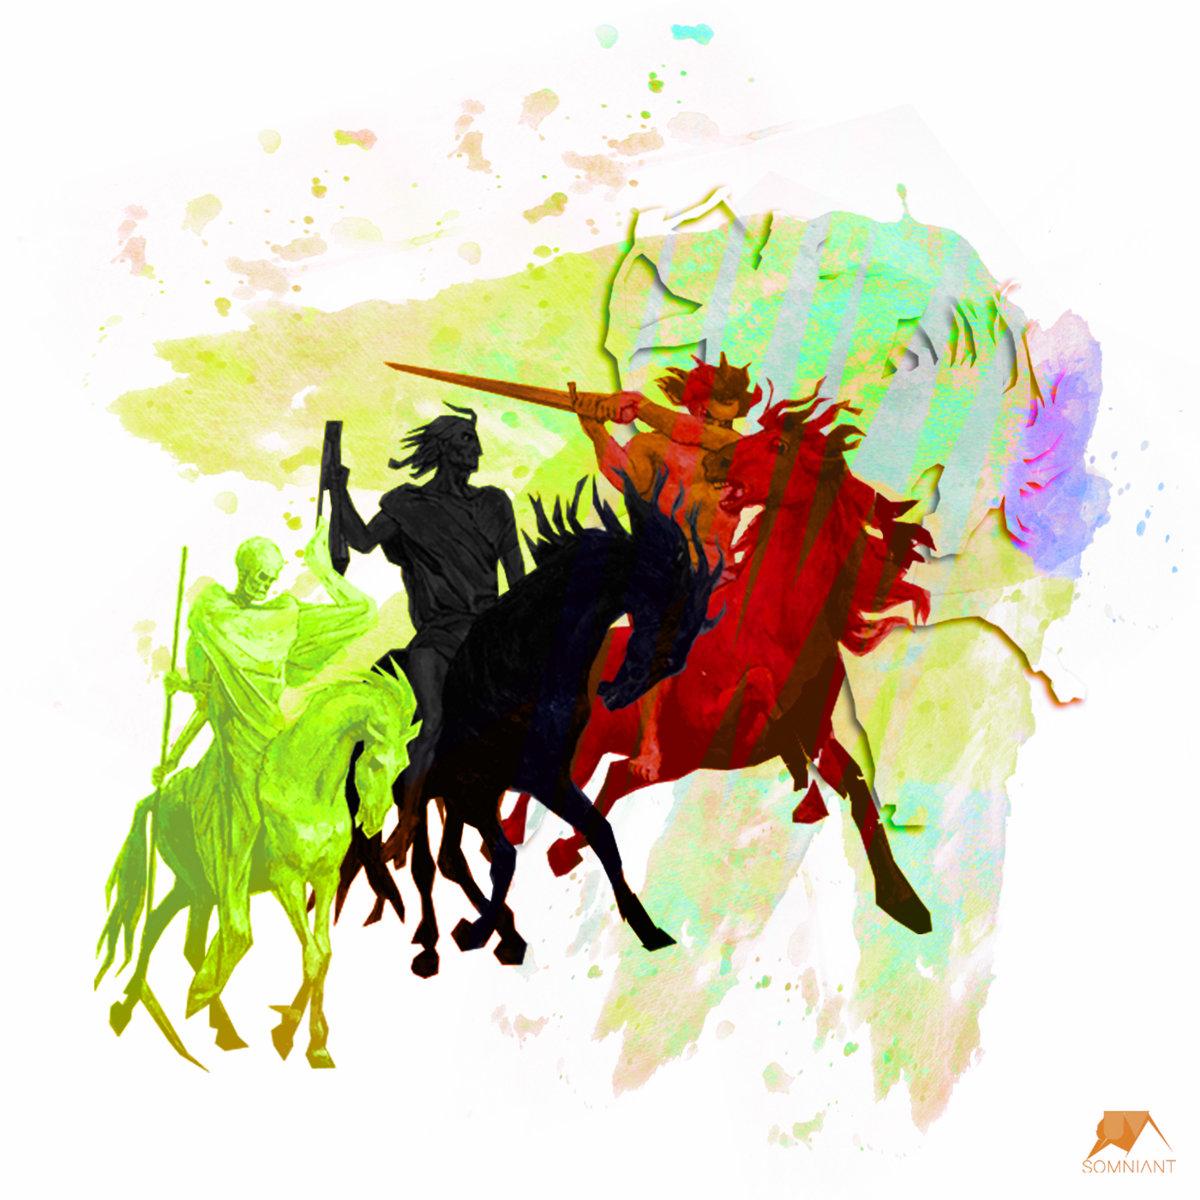 Riders On The Storm The Doors Wse Reinterpretation Wse The